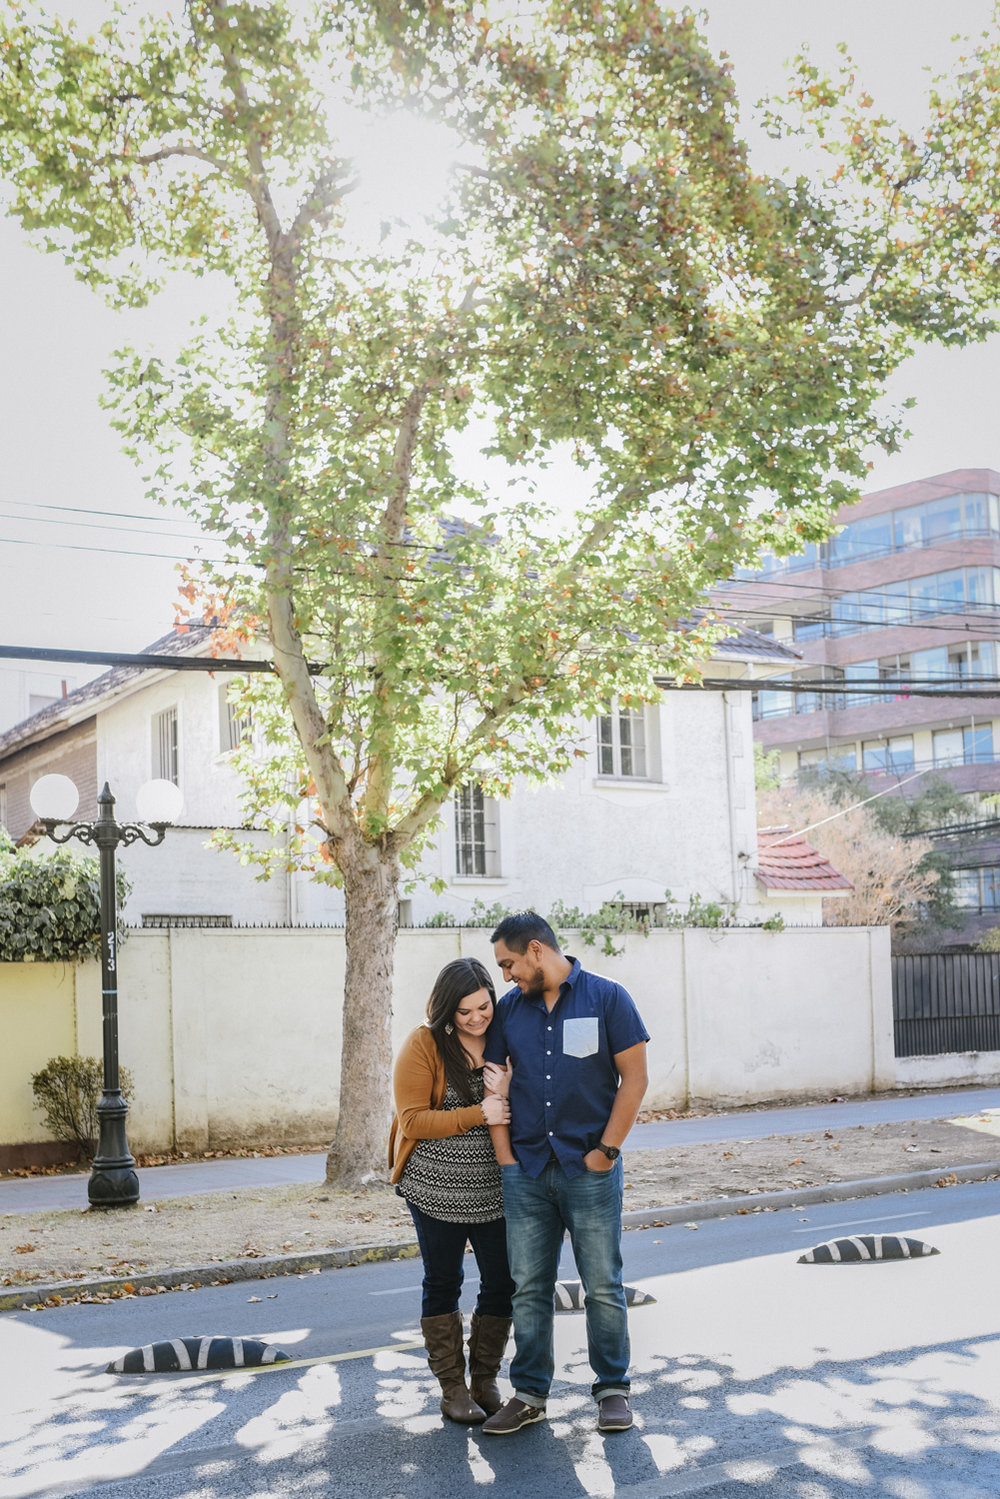 Sarah+David-Santiago-Chile-engagement-texas-houstonengagements-2.jpg